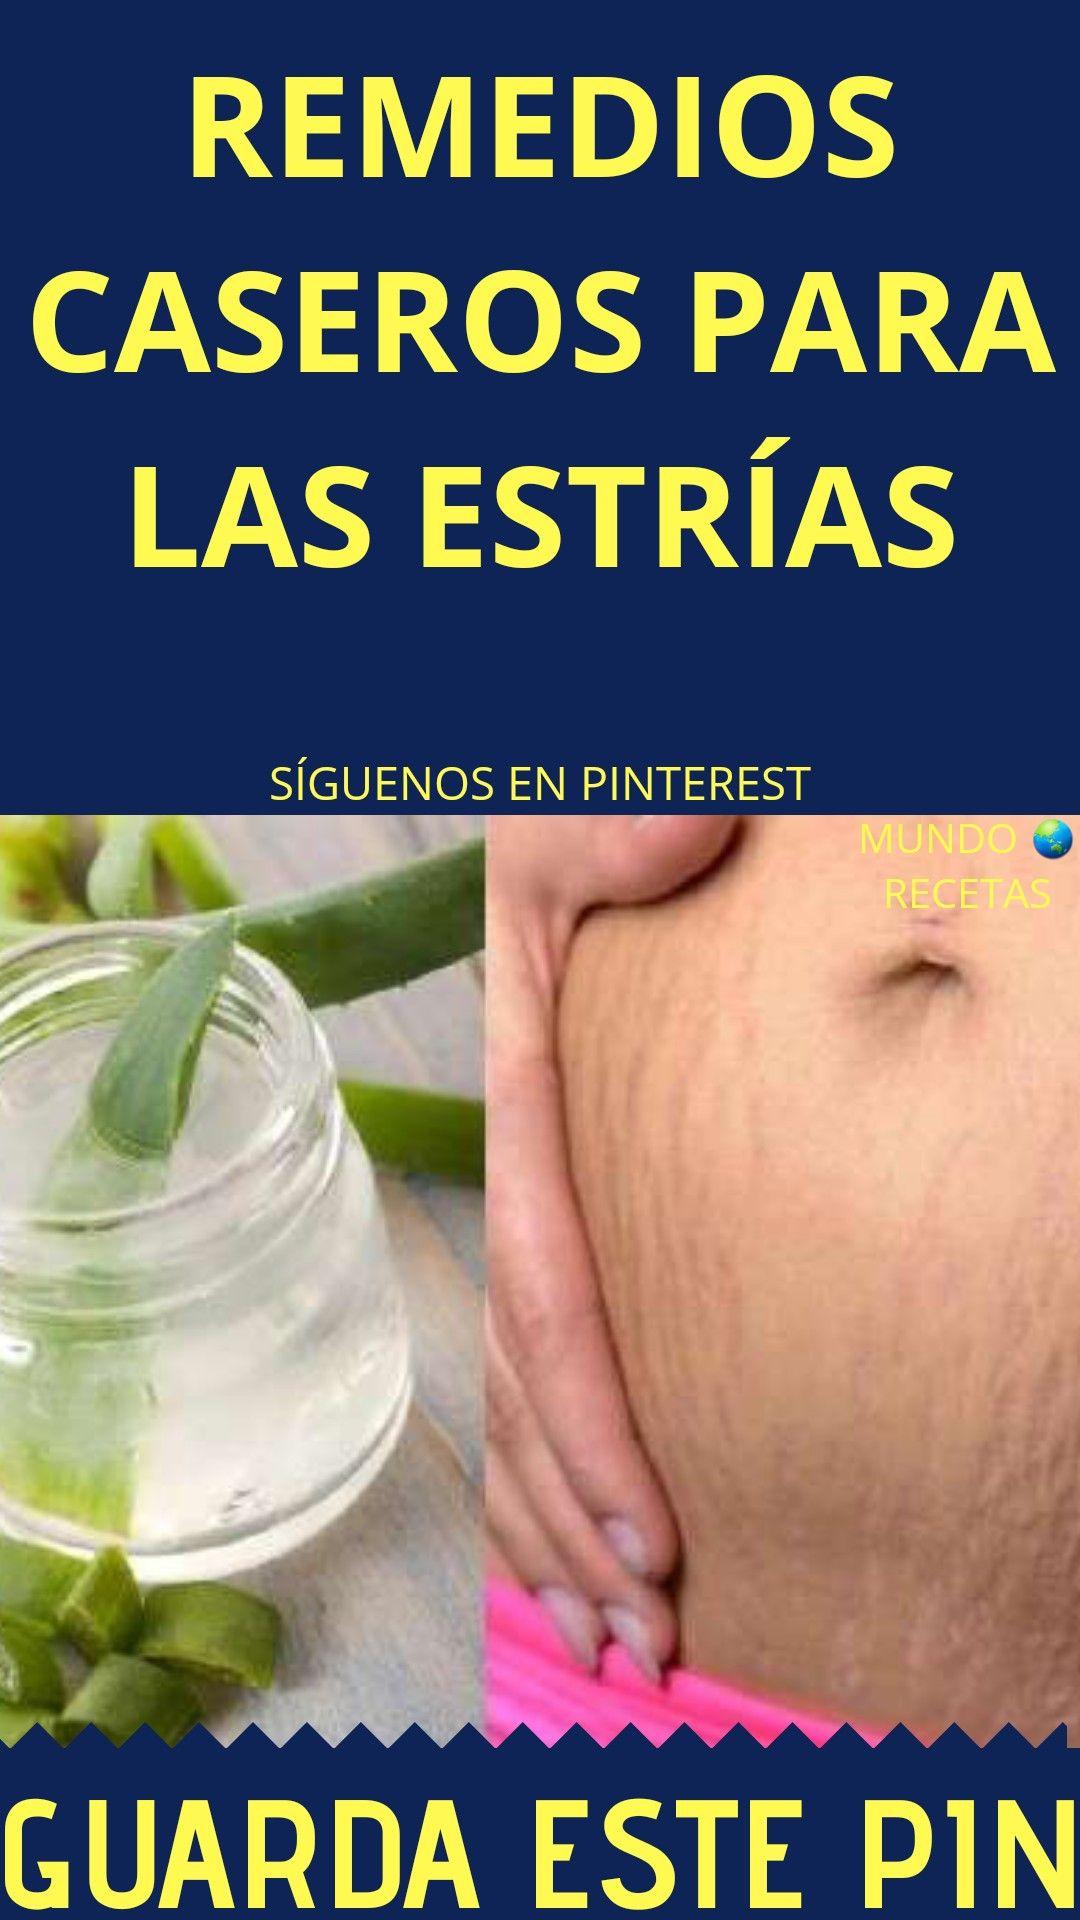 Remedioscaseros Para Las Estrías Hand Soap Bottle Soap Bottle Hand Soap